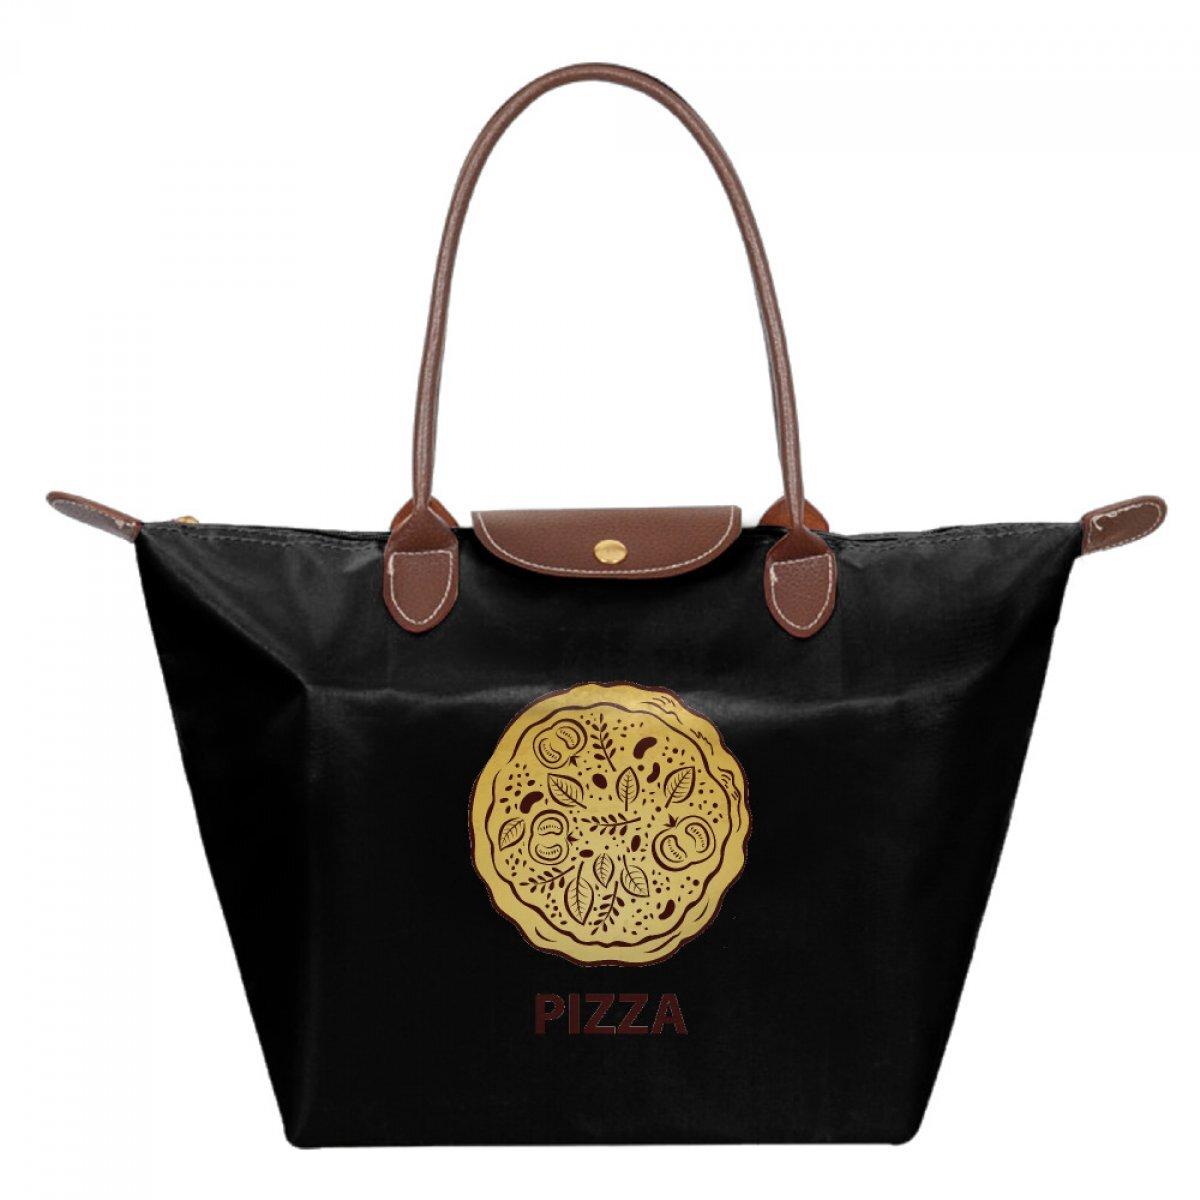 PhoRock Foldable Nylon Bag Tote Women Dumpling Bags Waterproof Shopping Handbags Yellow Pizza Printed Hobo Bag JZMS004 0